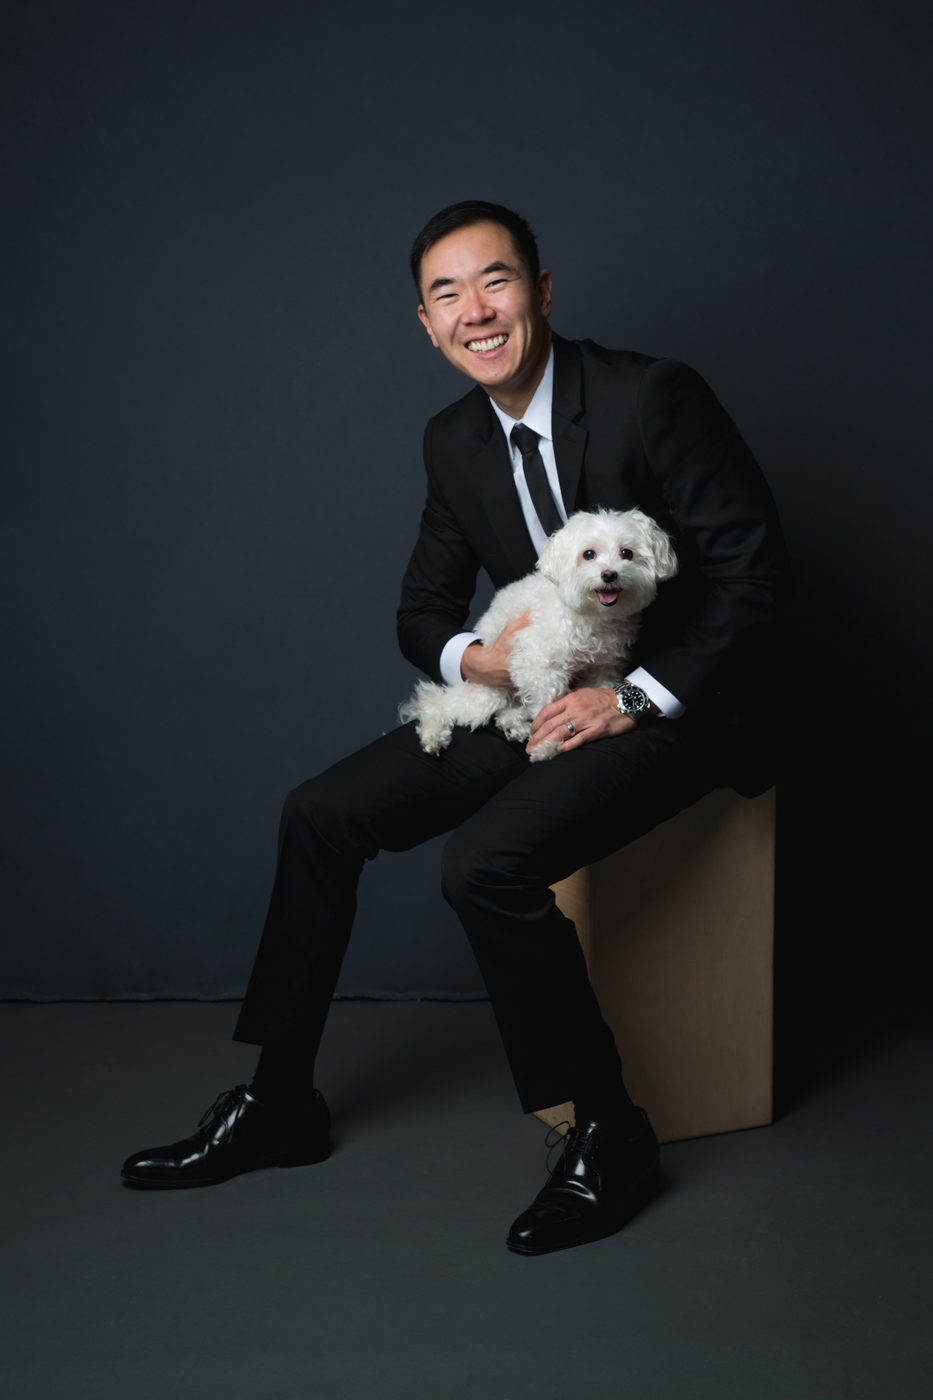 David Kim Photographer